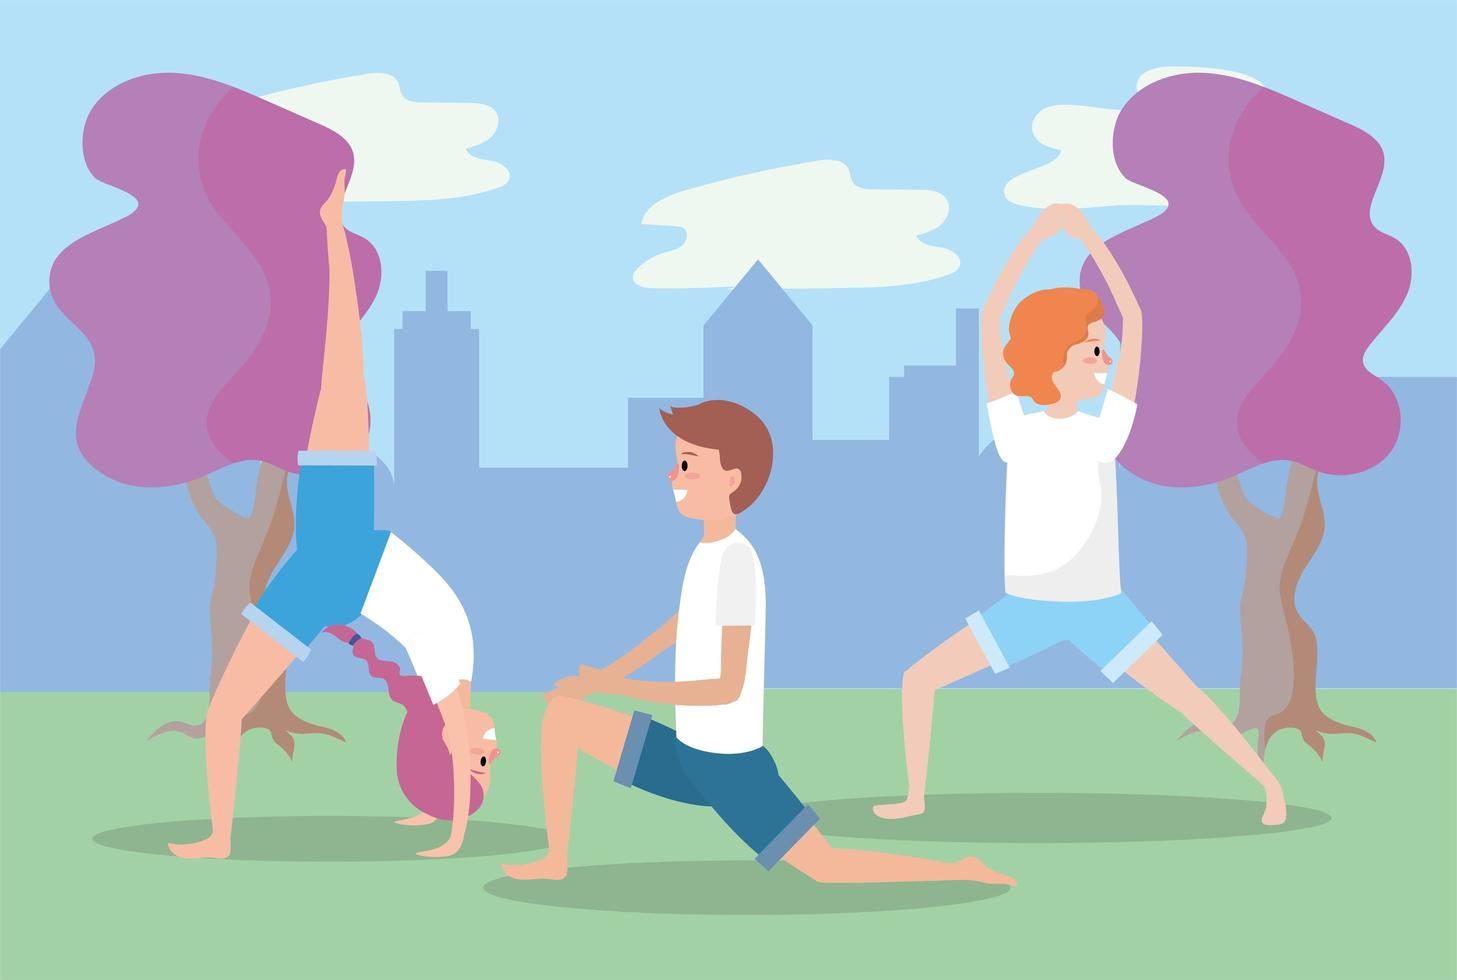 unga människor som gör yoga utomhus vektor